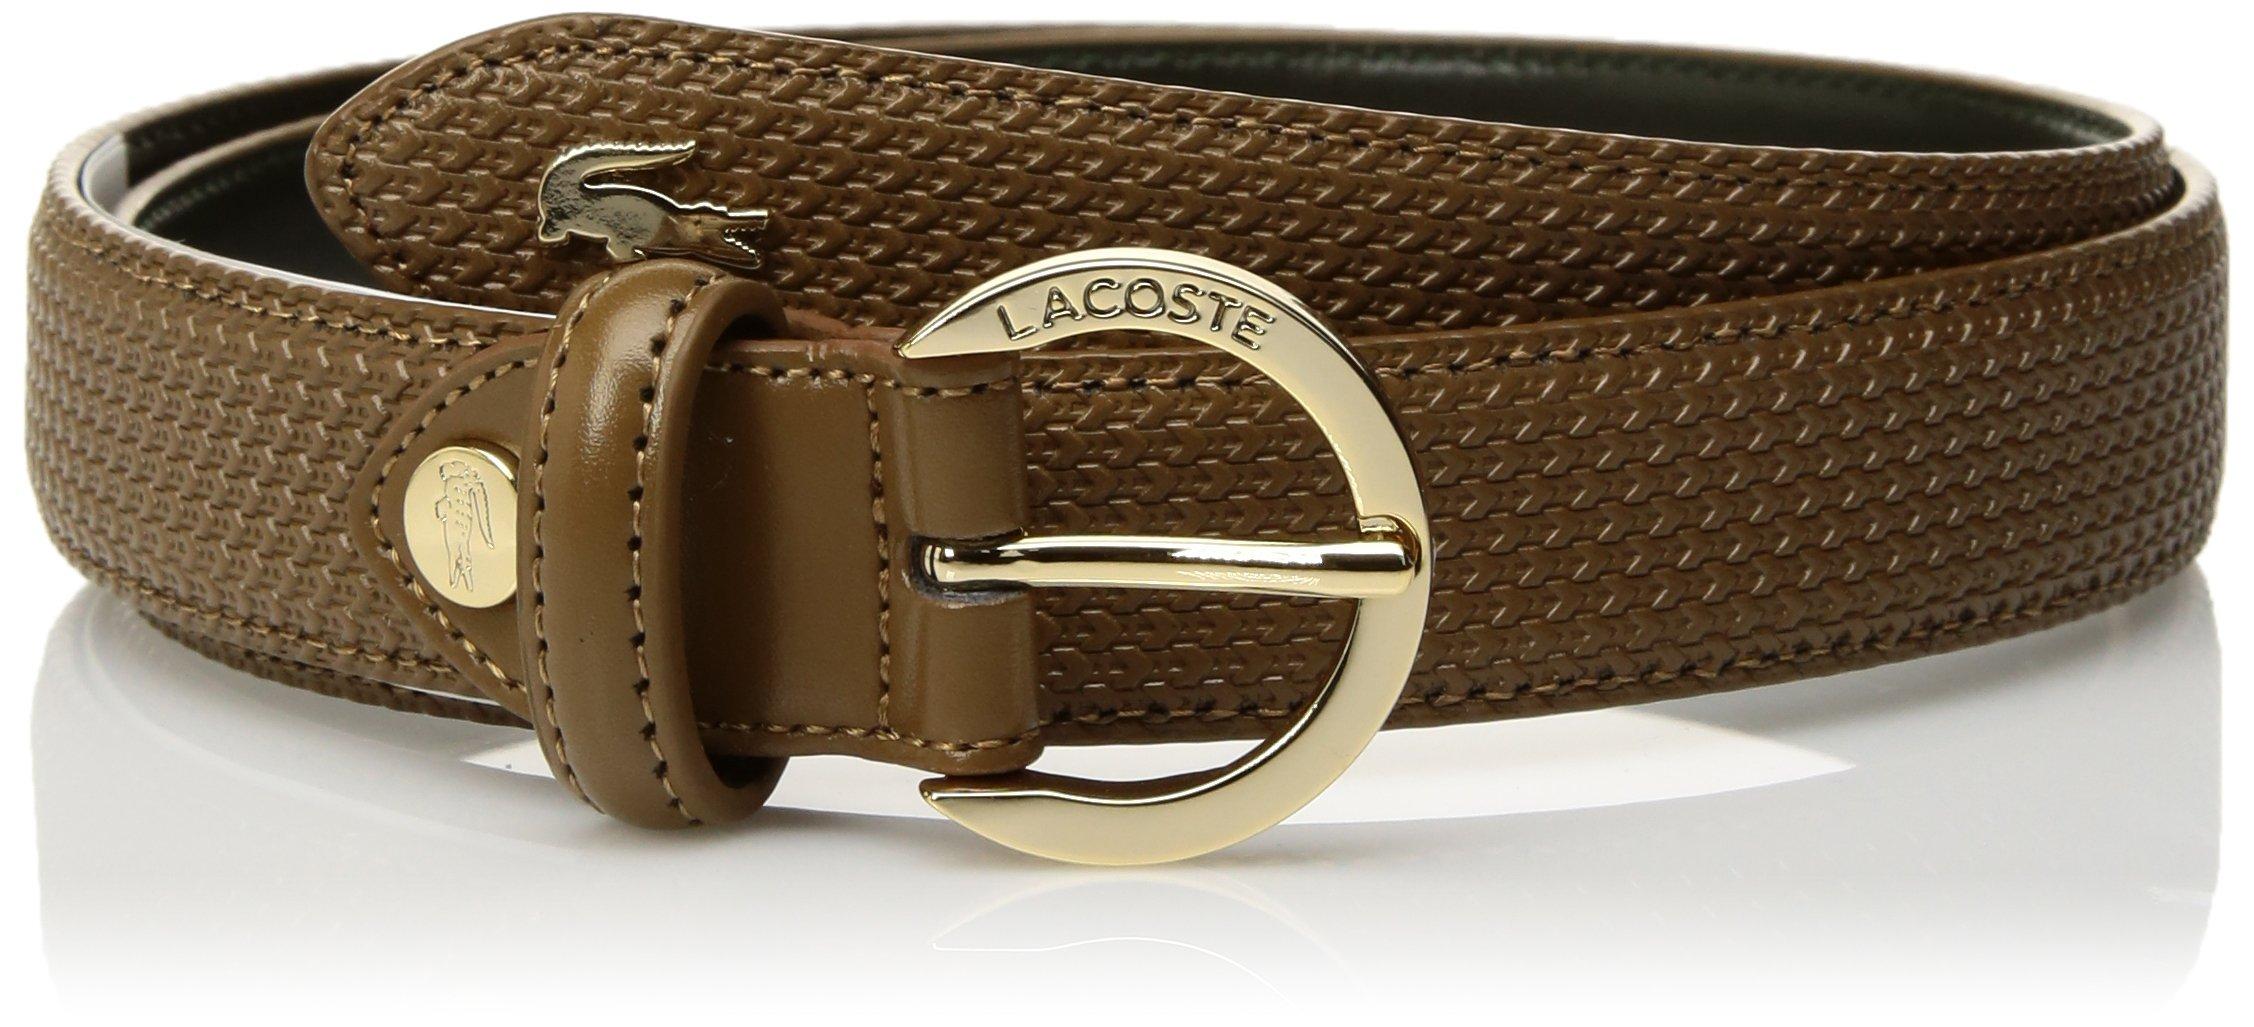 Lacoste Women's Premium Chantaco Coated Leather Belt, Breen, 39 in